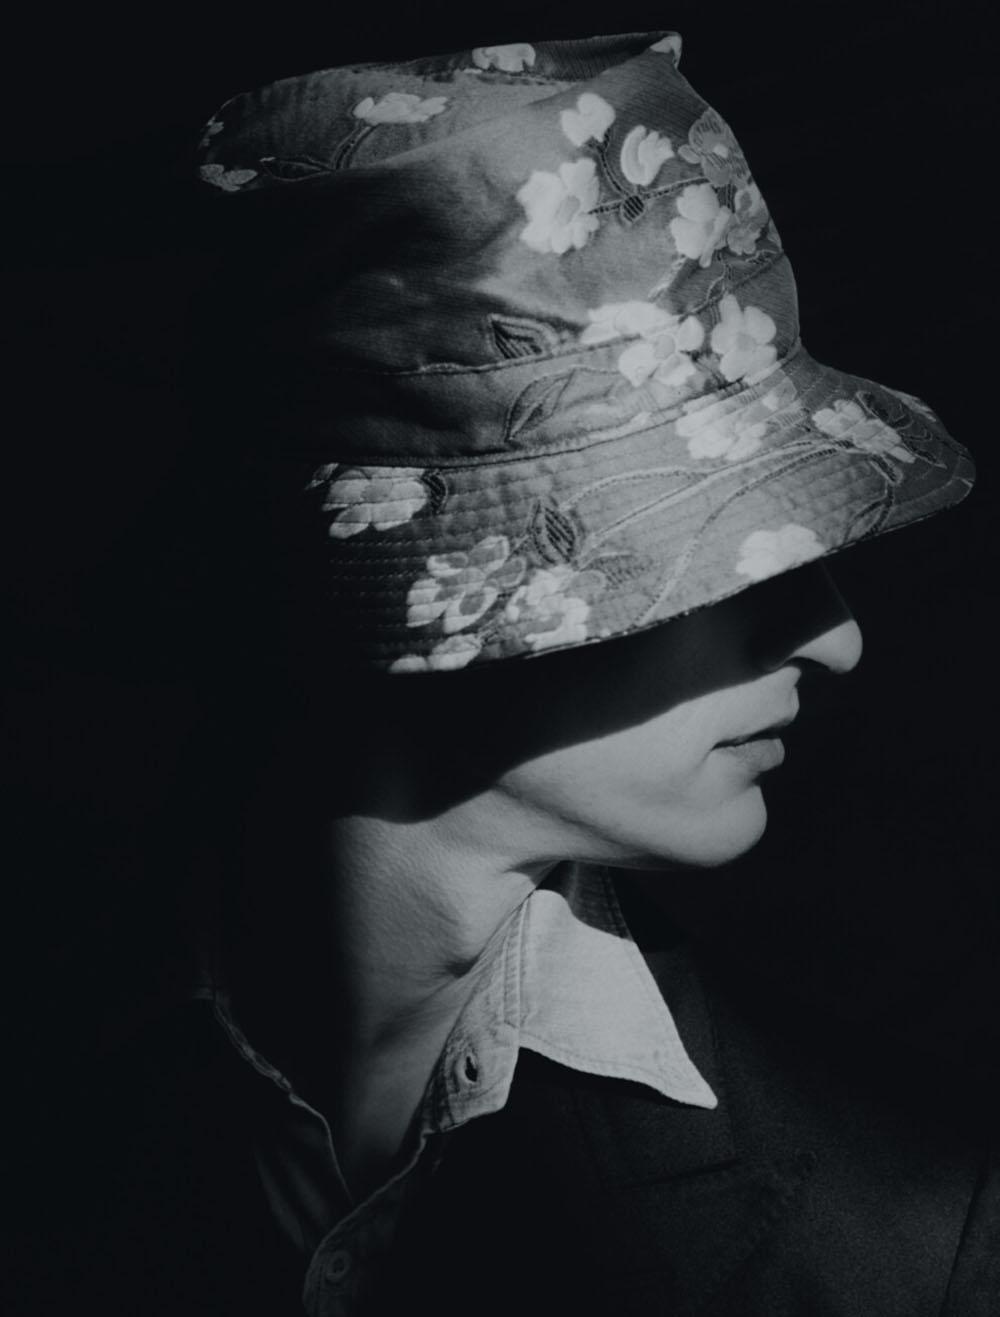 Rogier Bosschaart by Paolo Zerbini for Vogue Ukraine Man Spring Summer 2019